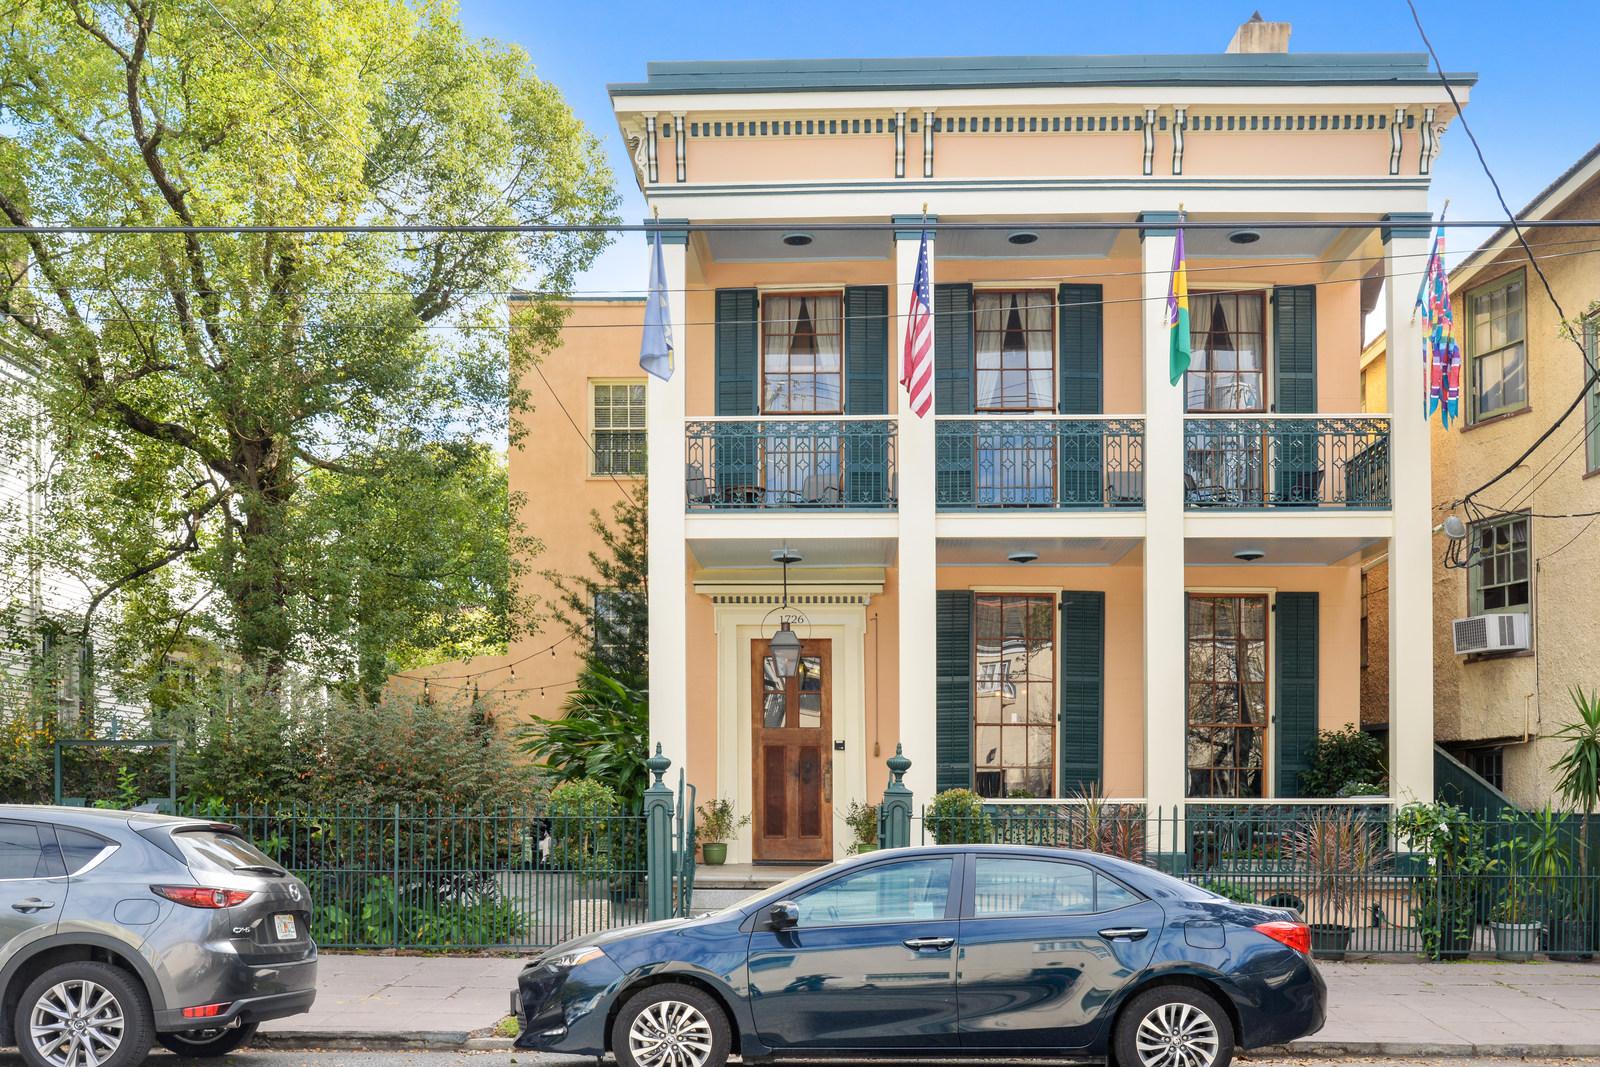 New Orleans, Louisiana 70130